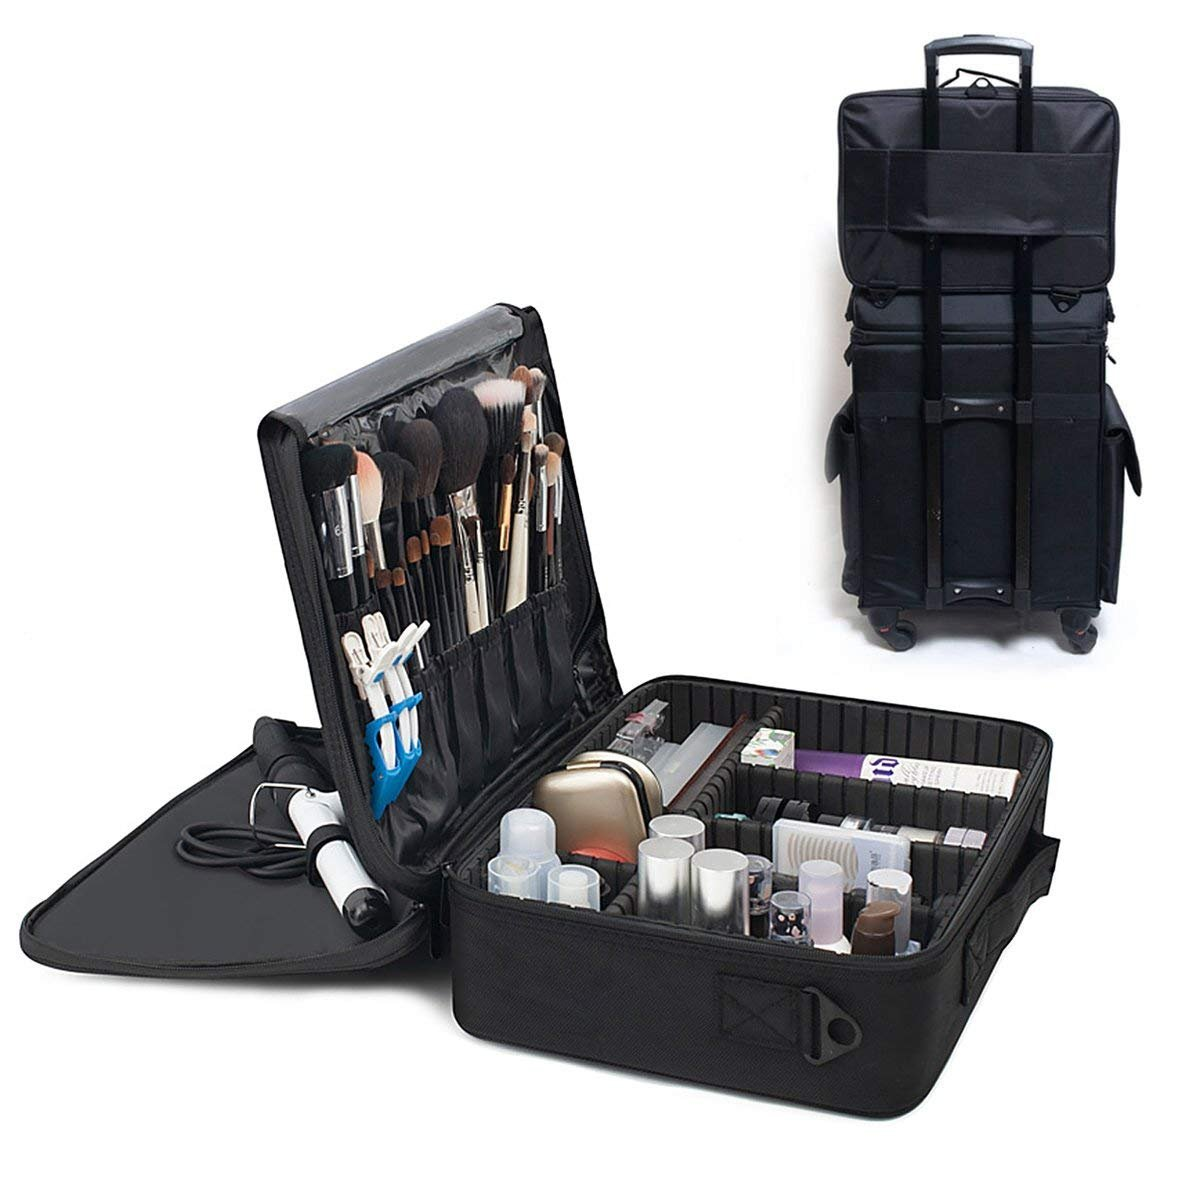 Makeup Train case,Professional Portable MakeUp Artist Case,Waterproof MakeUp Organizer Bag,3 Layer with Adjustable Shoulder.